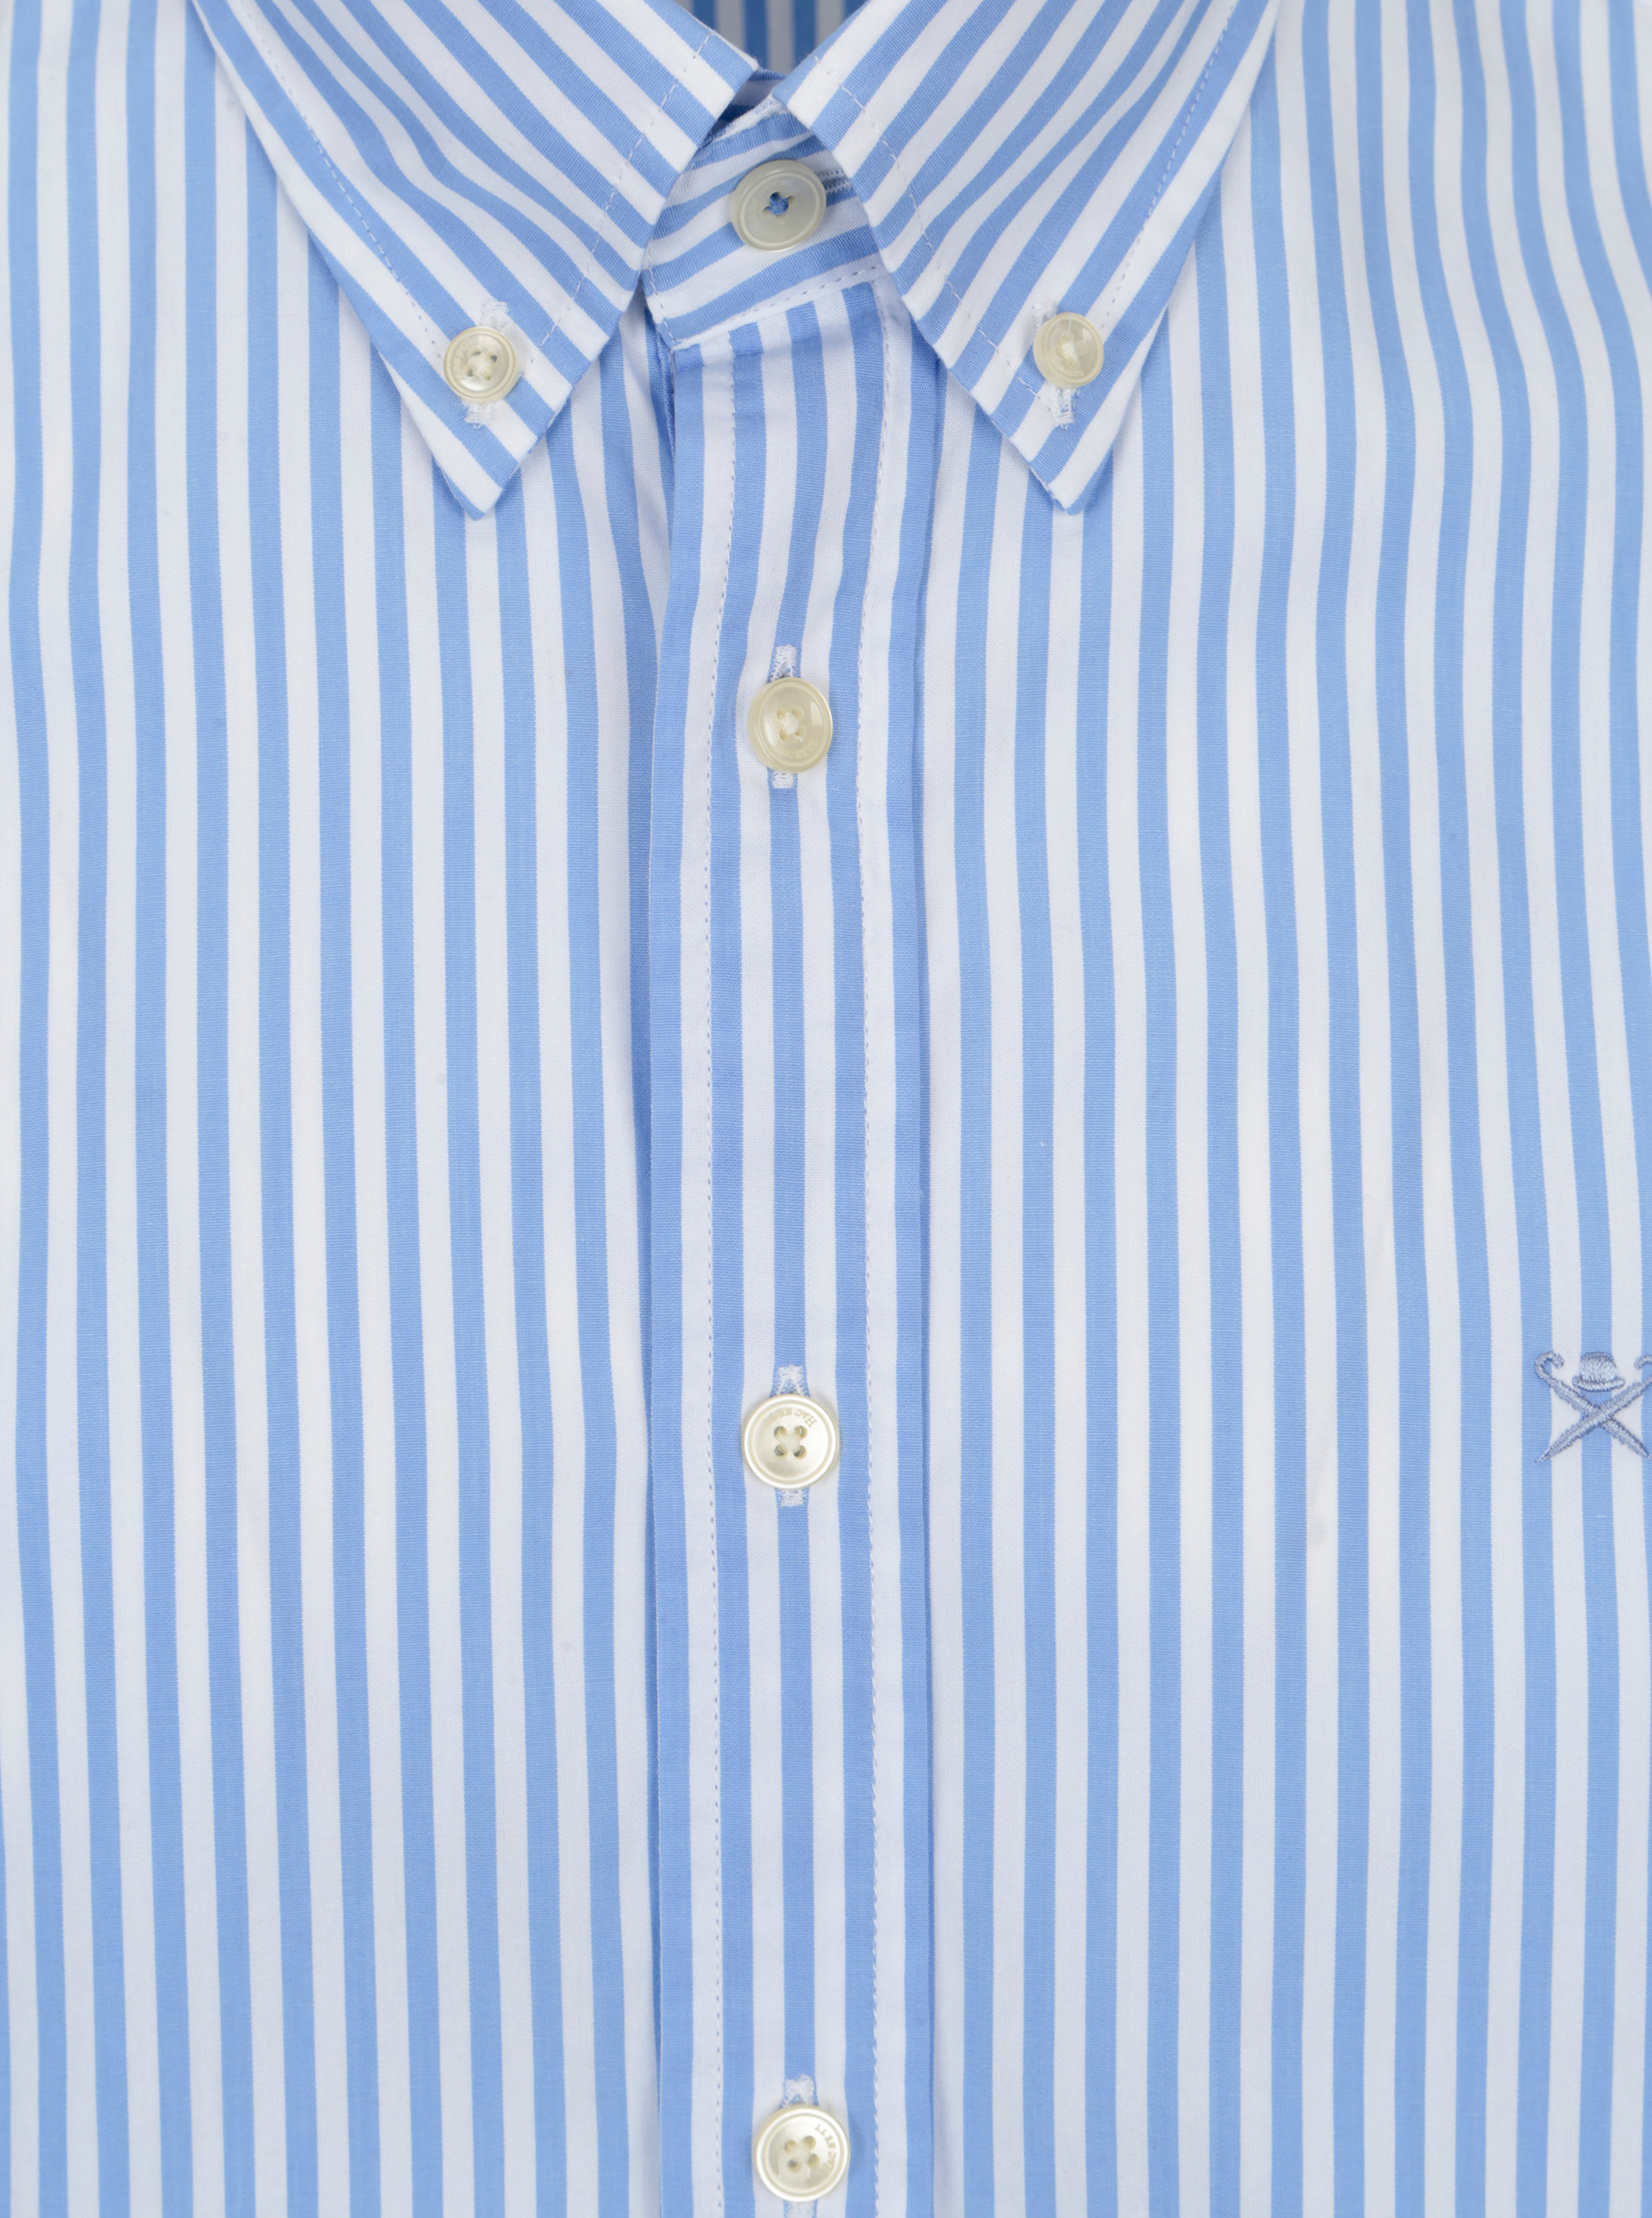 05a67a601e5c Bielo-modrá pruhovaná classic fit košeľa Hackett London ...